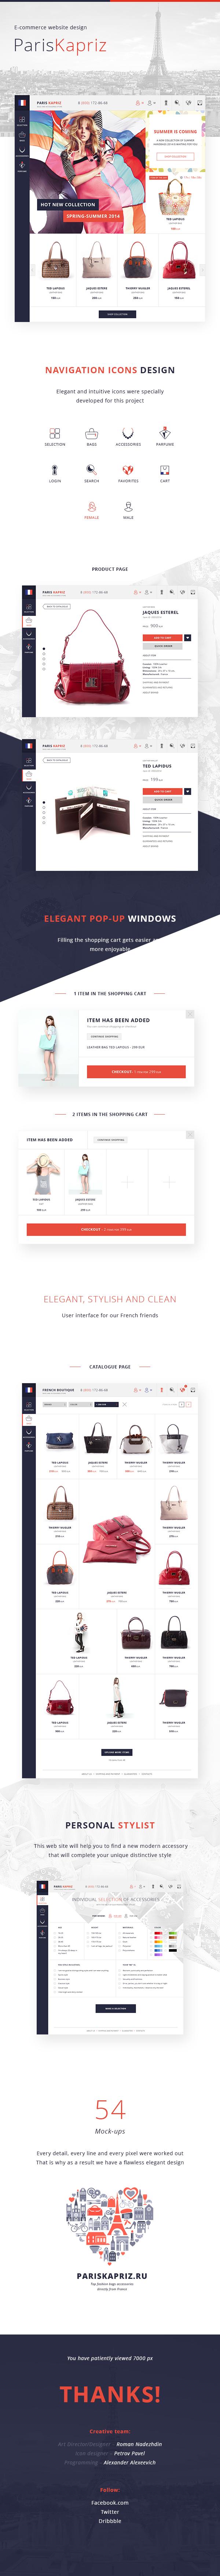 ParisKapriz - eCommerce website, Icon design on